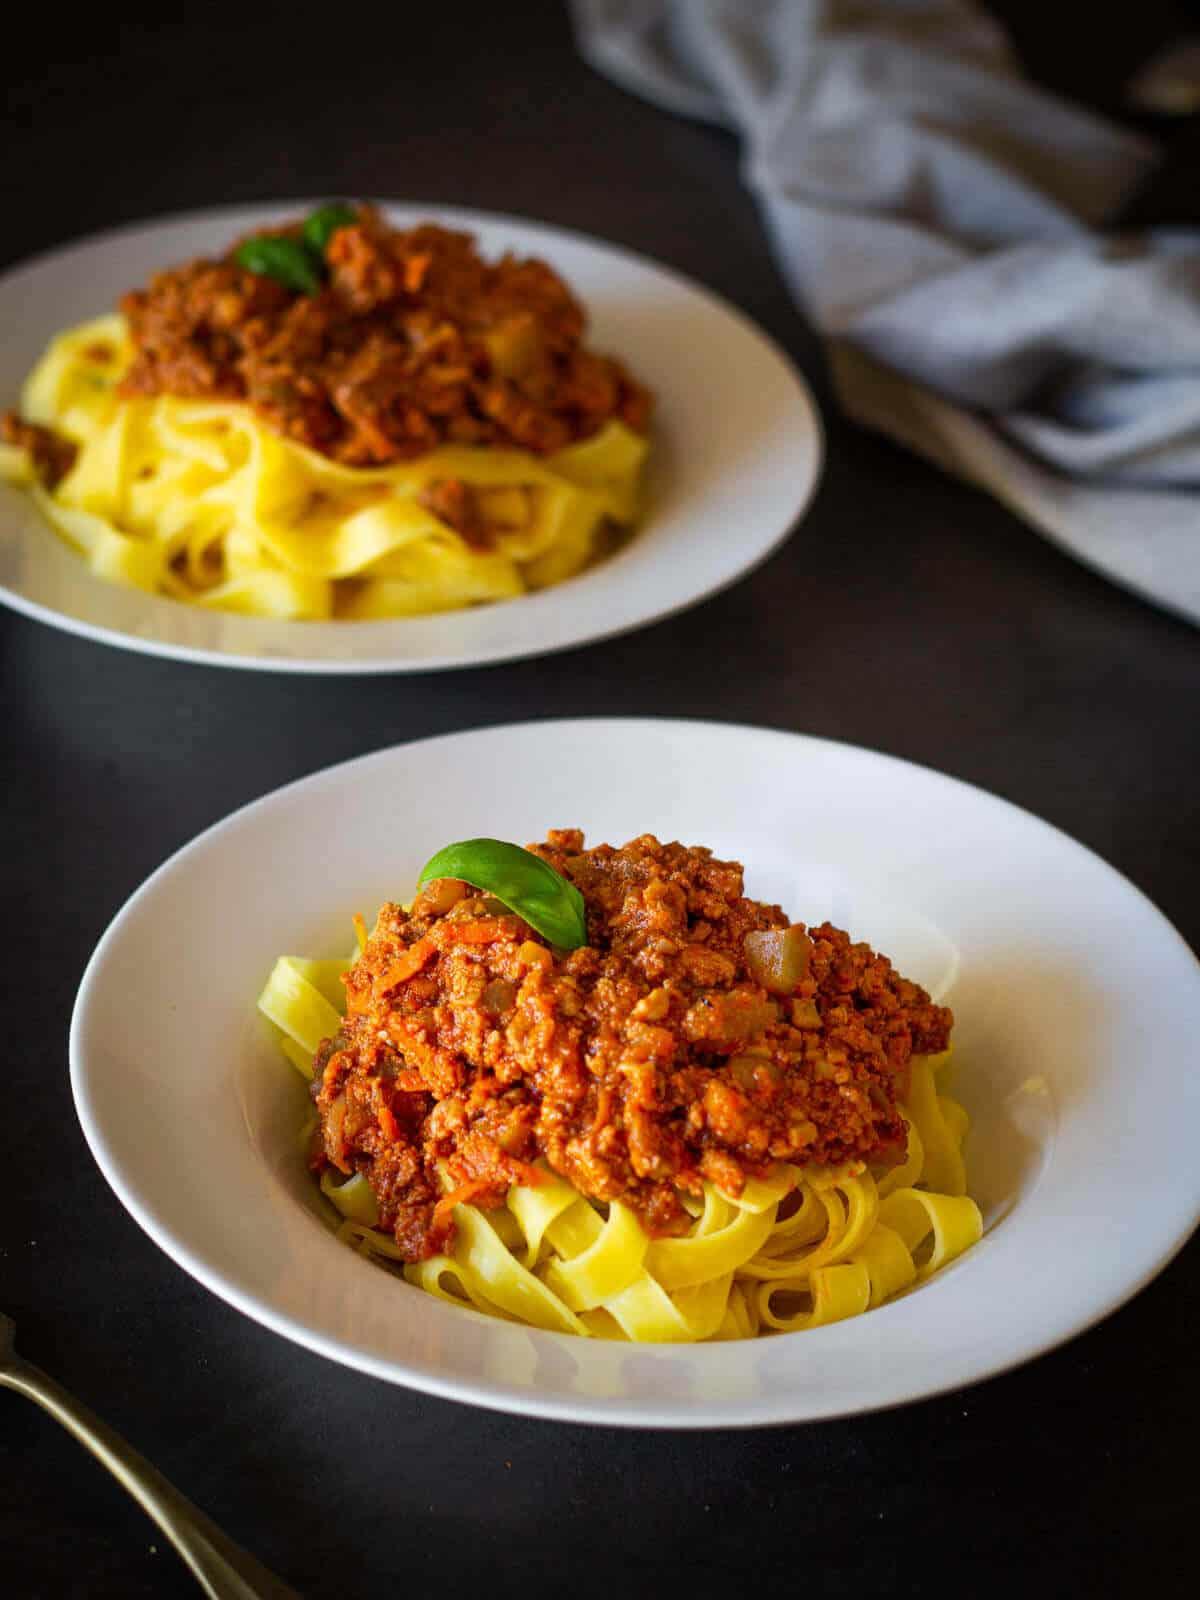 Vegetable Bolognese Spaghetti plated